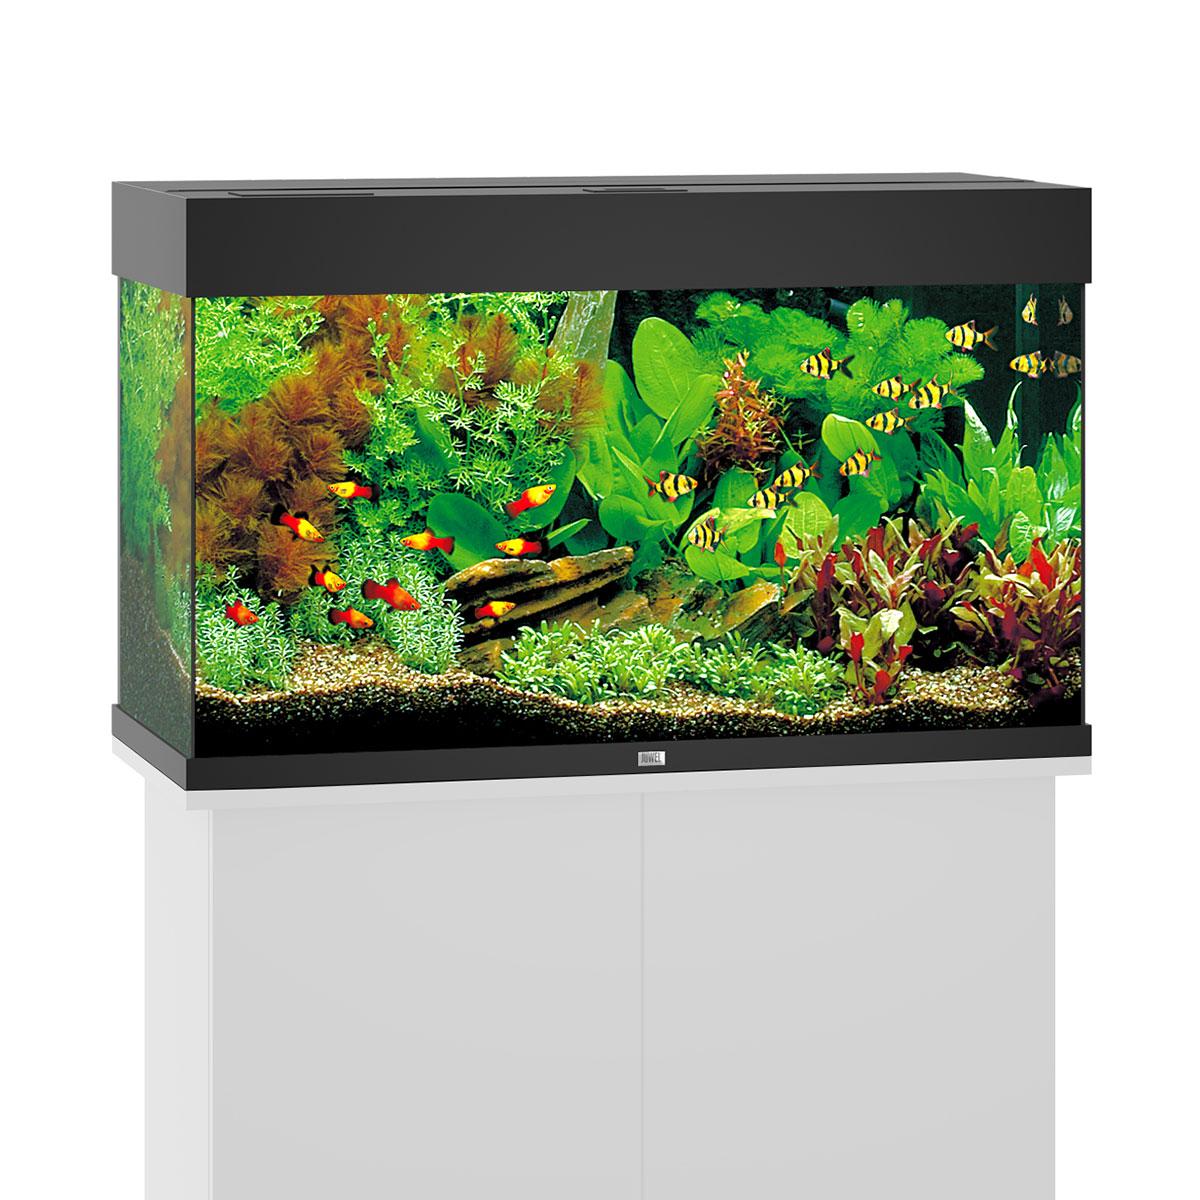 juwel aquarium becken g nstig kaufen bei zooroyal. Black Bedroom Furniture Sets. Home Design Ideas